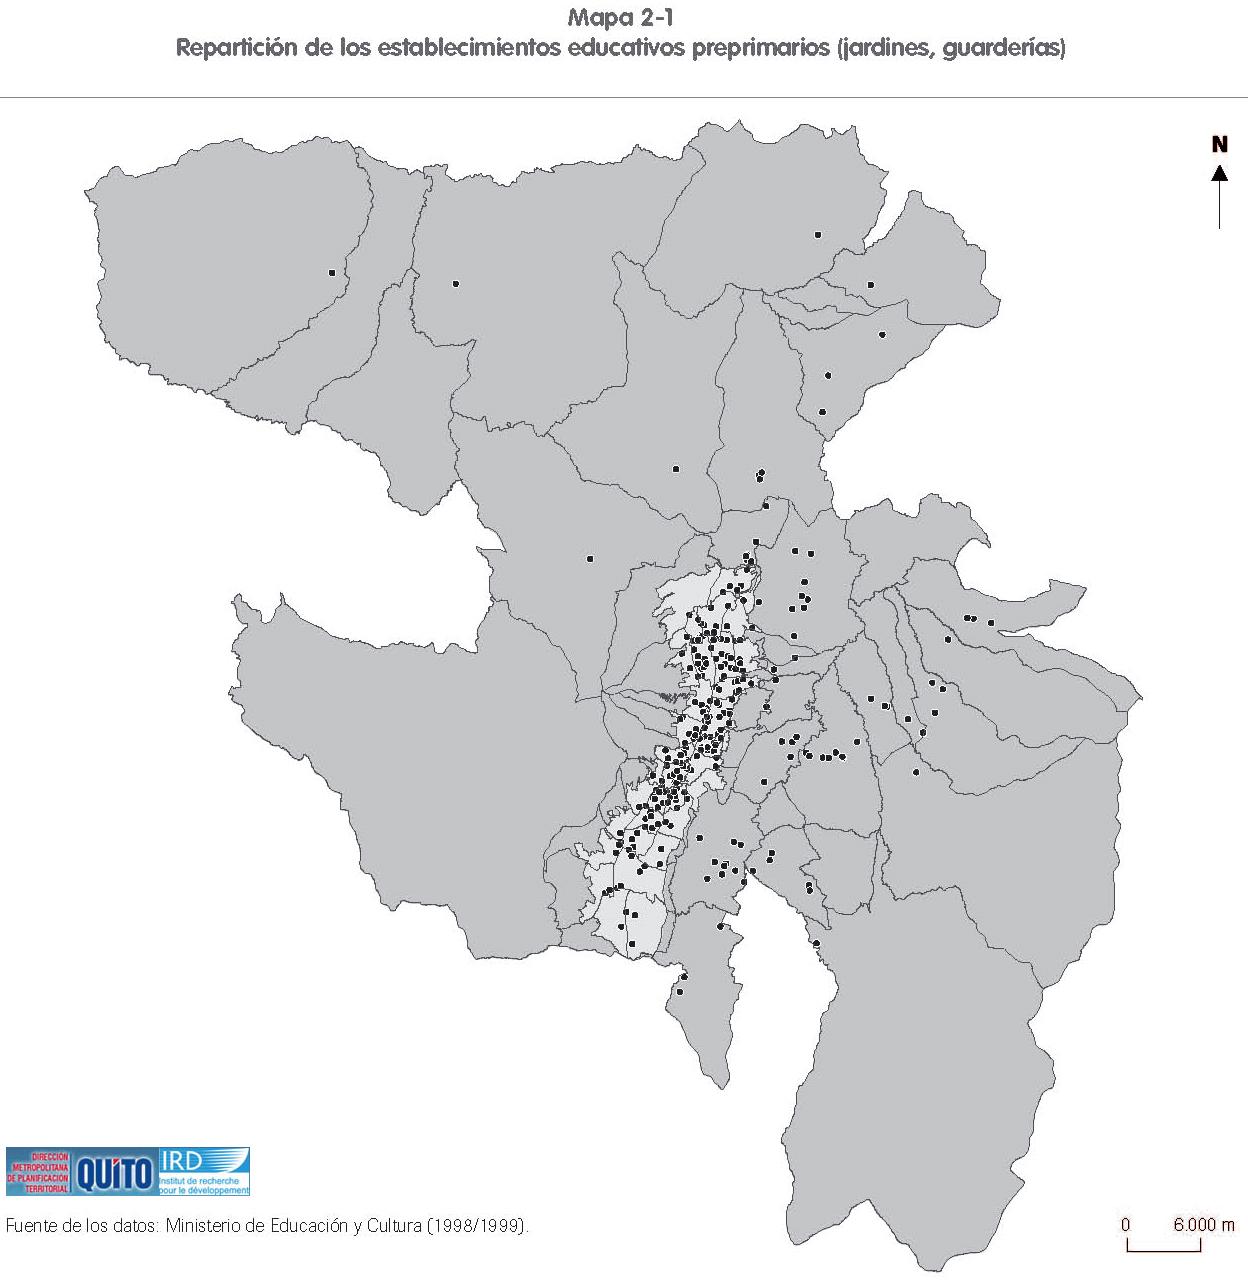 Pre-primary educational establishments in the Metropolitan District of Quito 2001